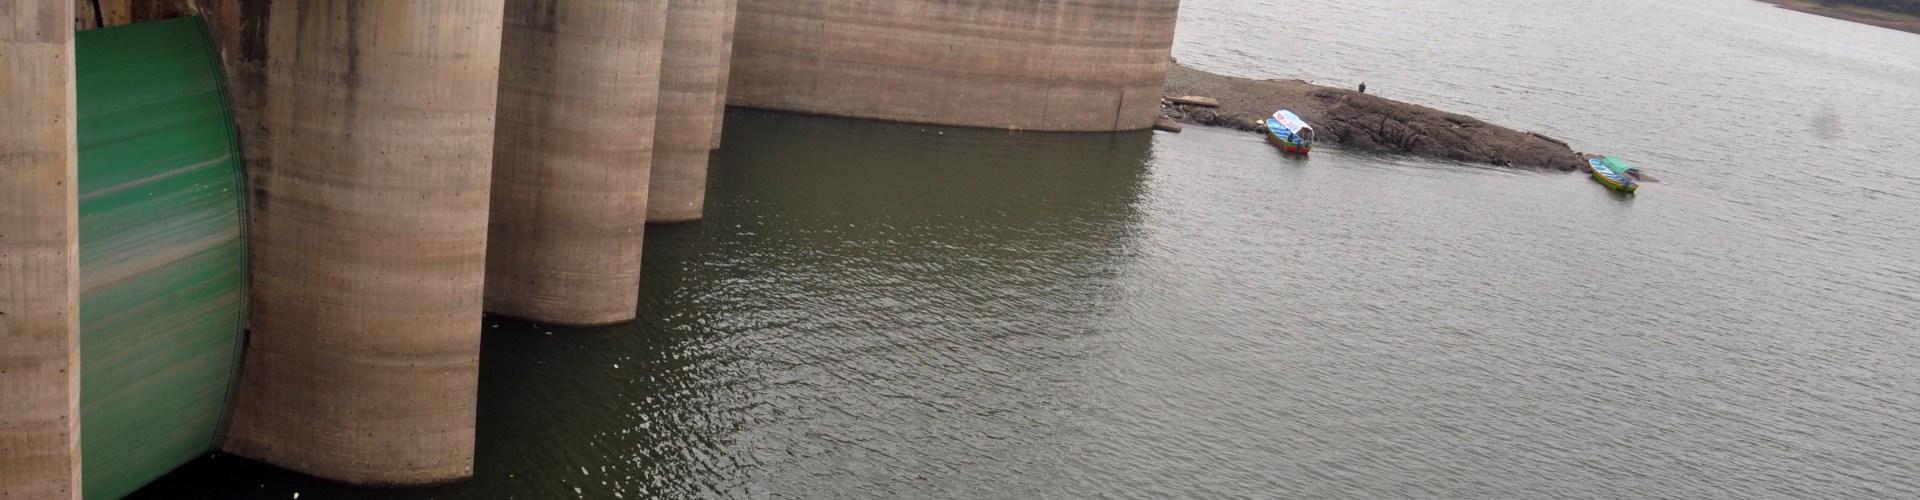 Lluvias hacen embalse presa tenga más agua